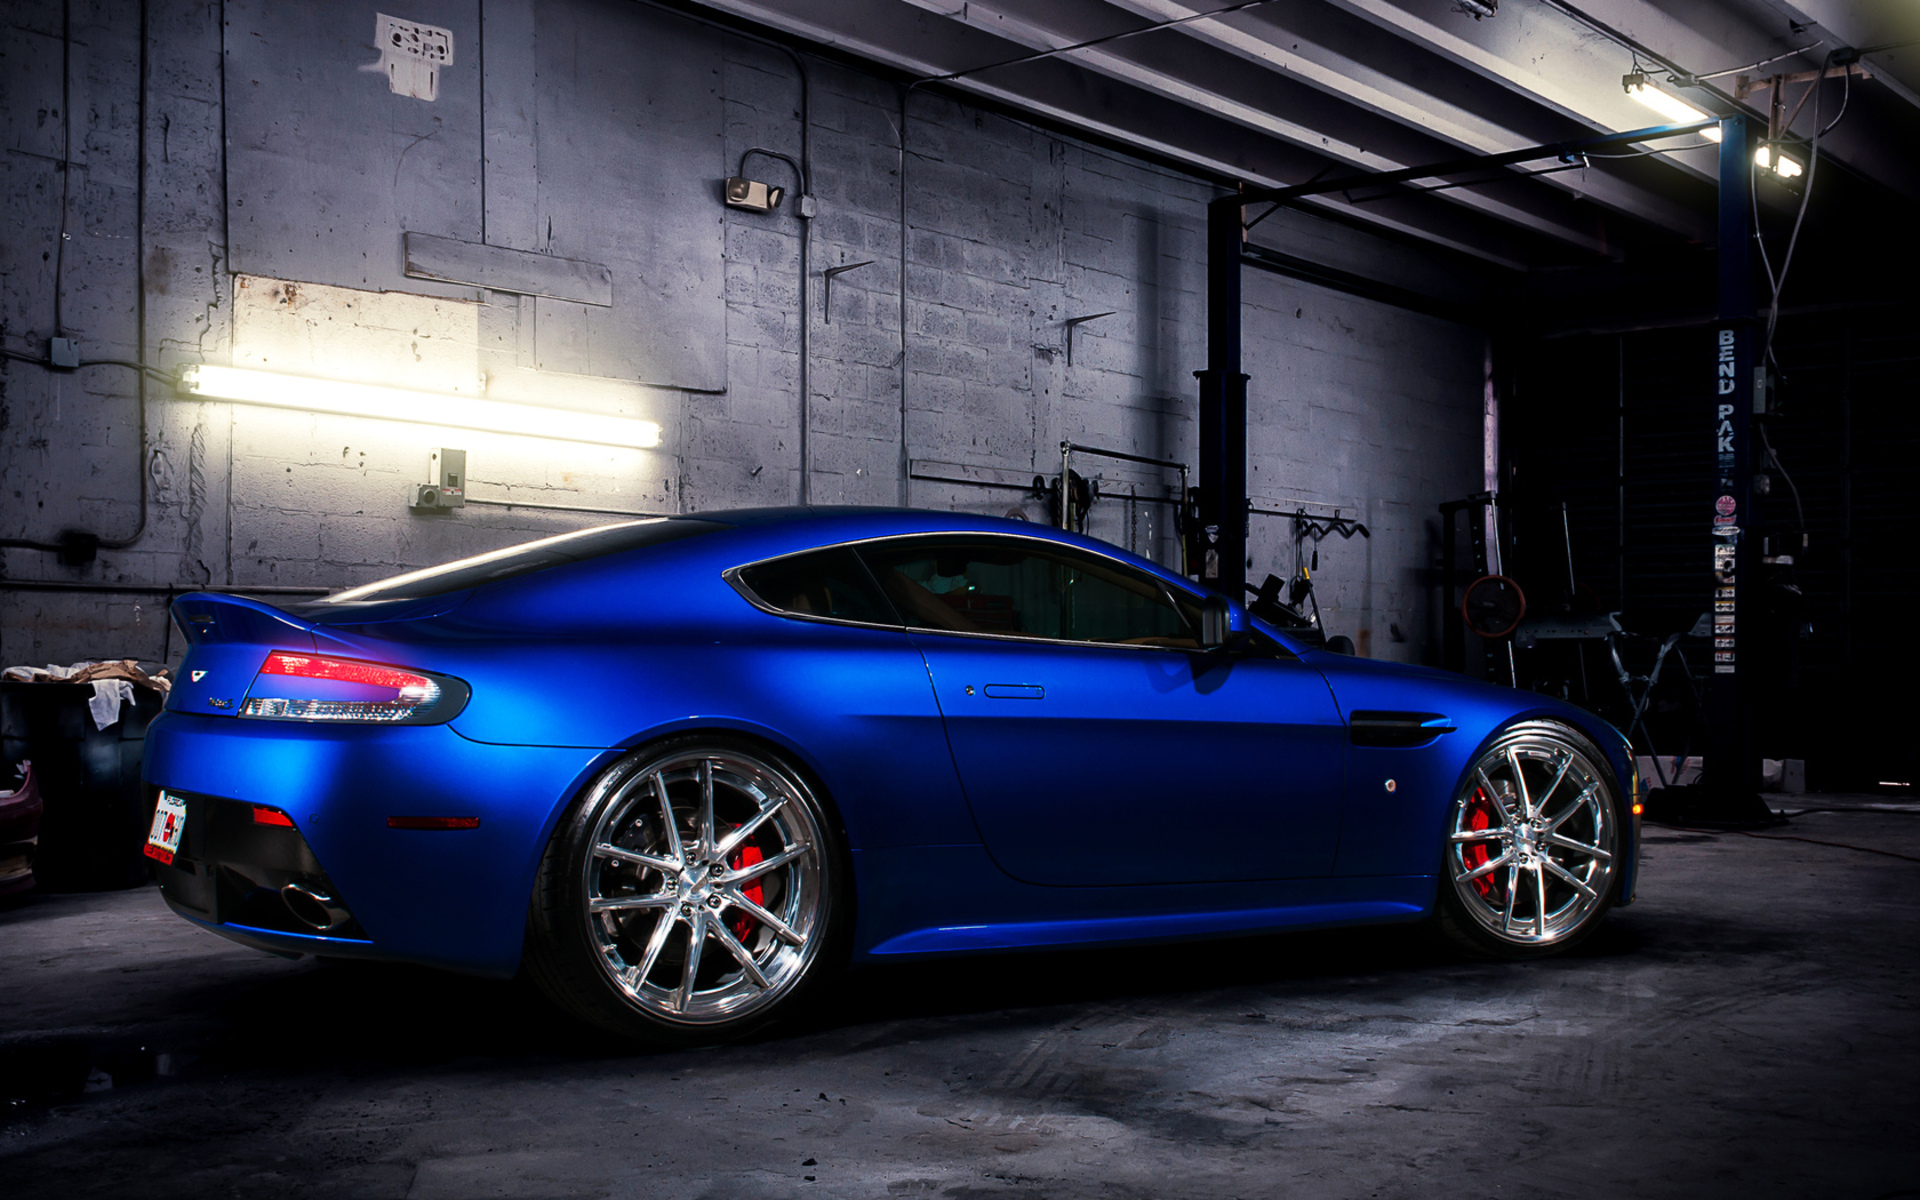 Aston Martin Vehicles Cars Blue Tuning Wheels Garage